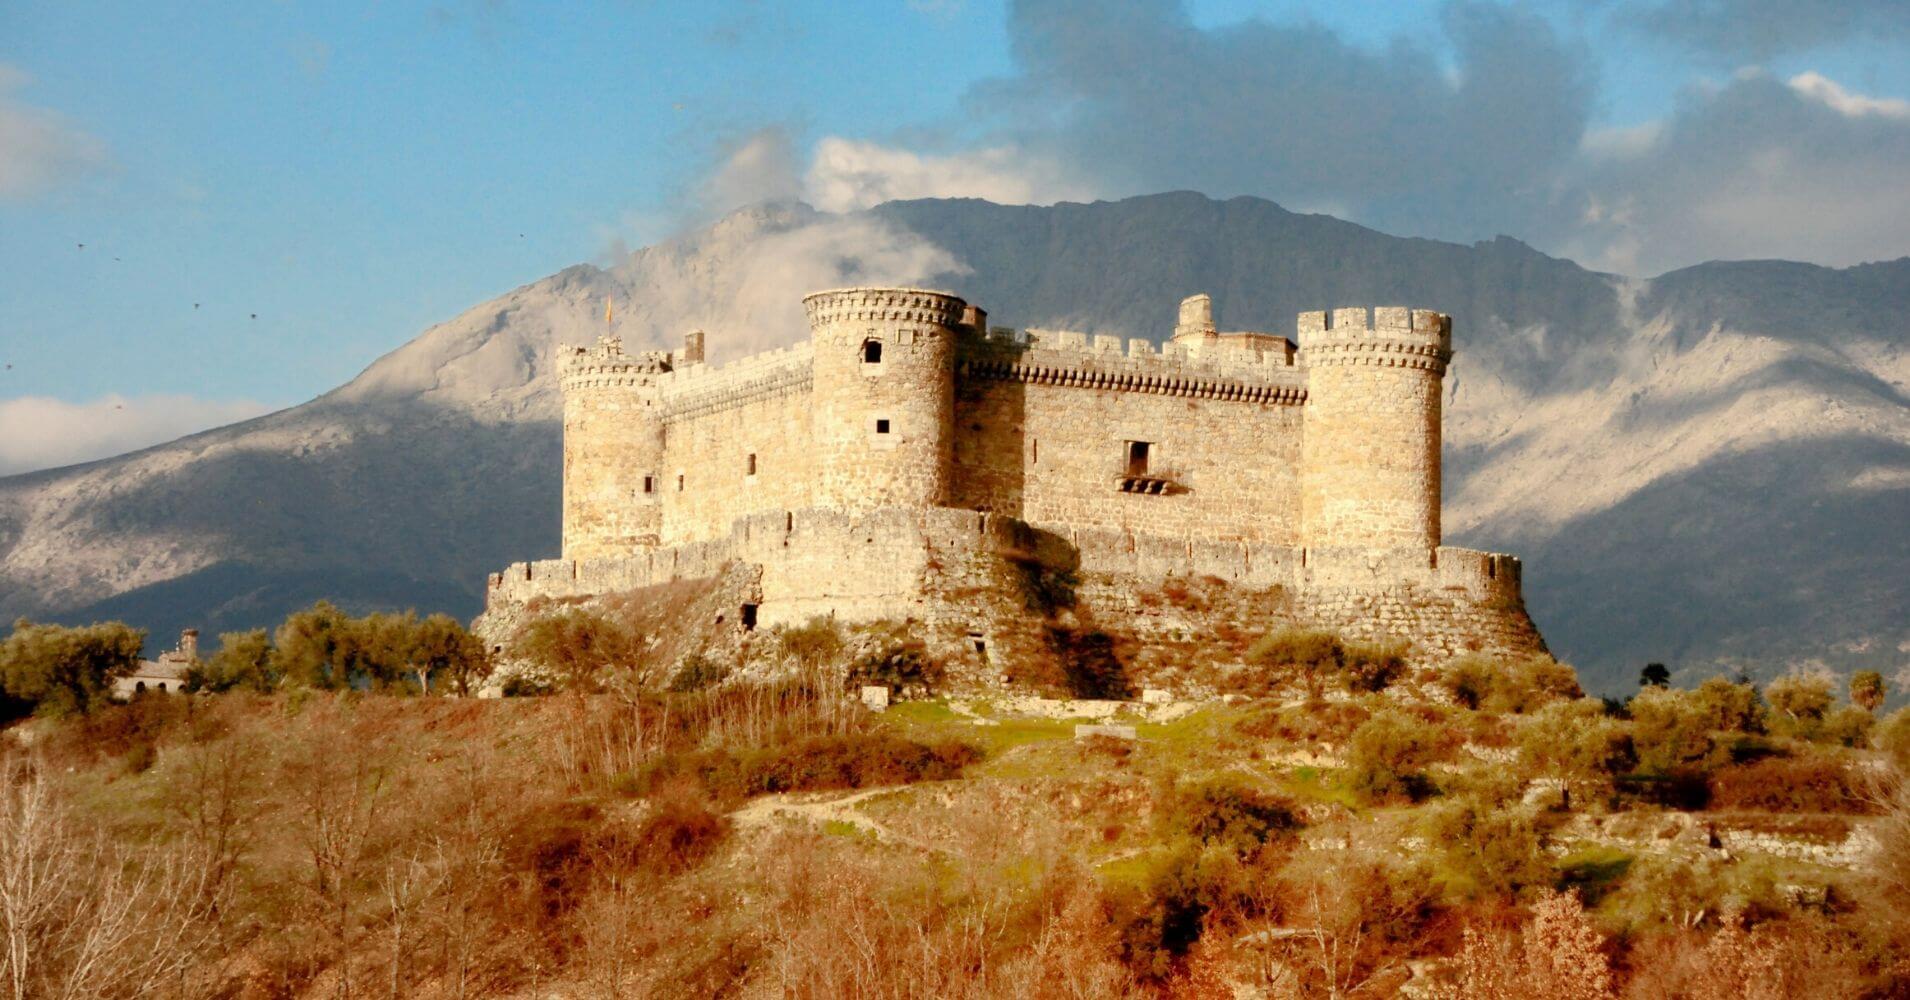 Castillo de Mombeltrán. Ávila, Castilla y León.